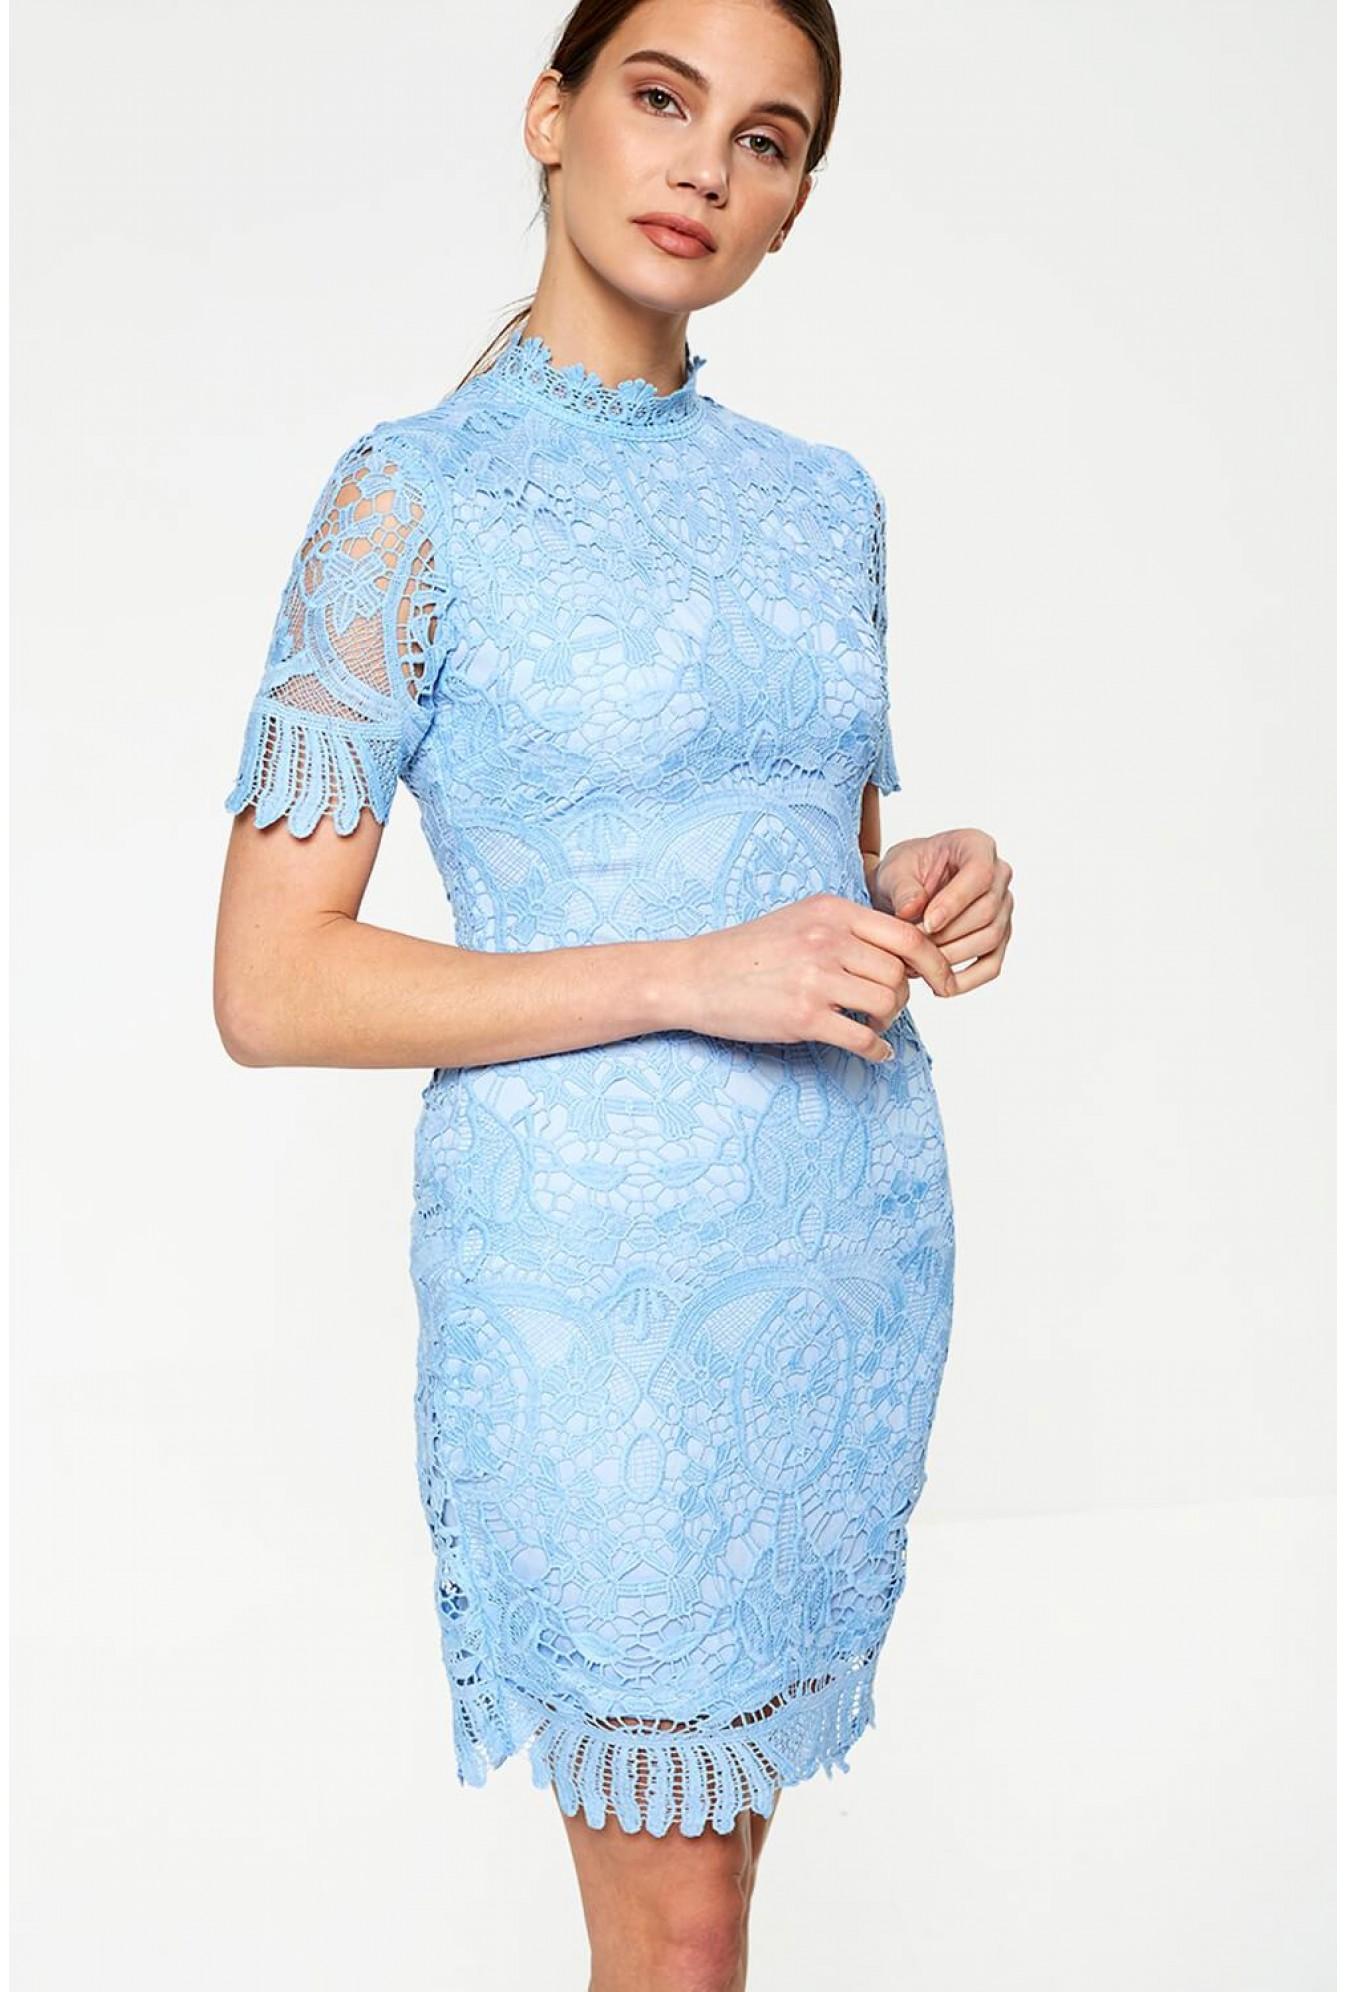 0eefcc934de9 Pixie Daisy Diana Crochet Overlay Midi Dress in Baby Blue